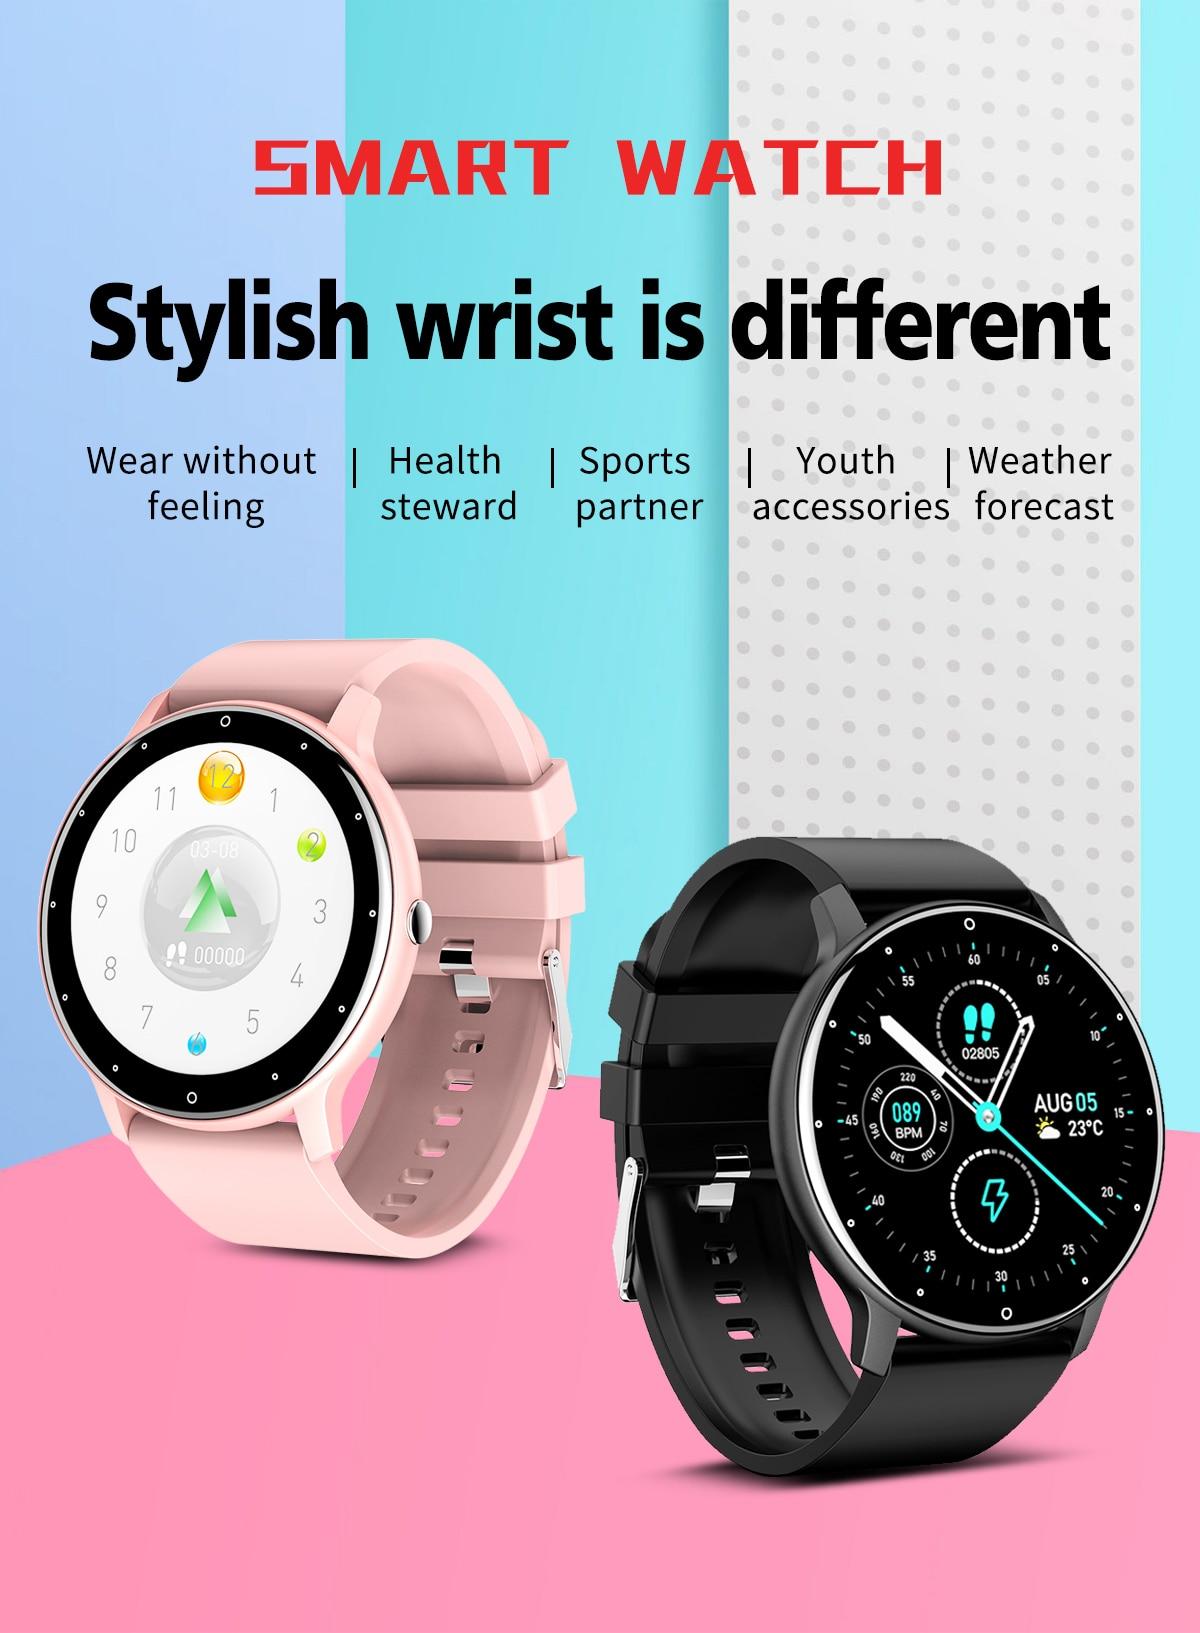 H0f59a0b7812a4d1b9604bcb68a371e50g LIGE 2021 Fashion Smart Watch Men Fitness Bracelet Heart Rate Blood Pressure Monitoring Sports Tracker Smartwatch Gift for Women